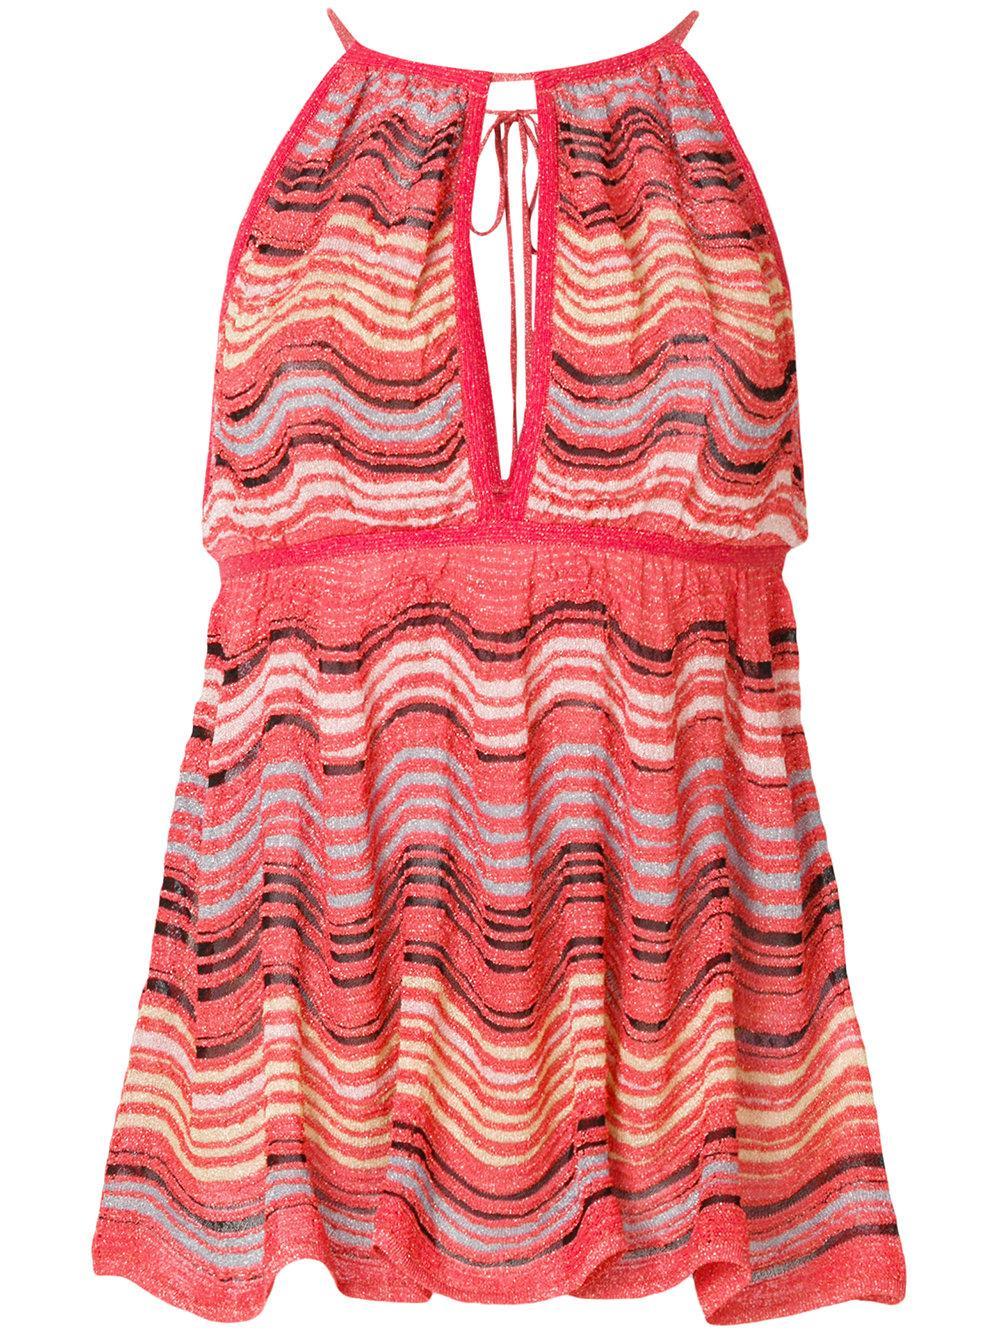 M Missoni Sleeveless Knit Top